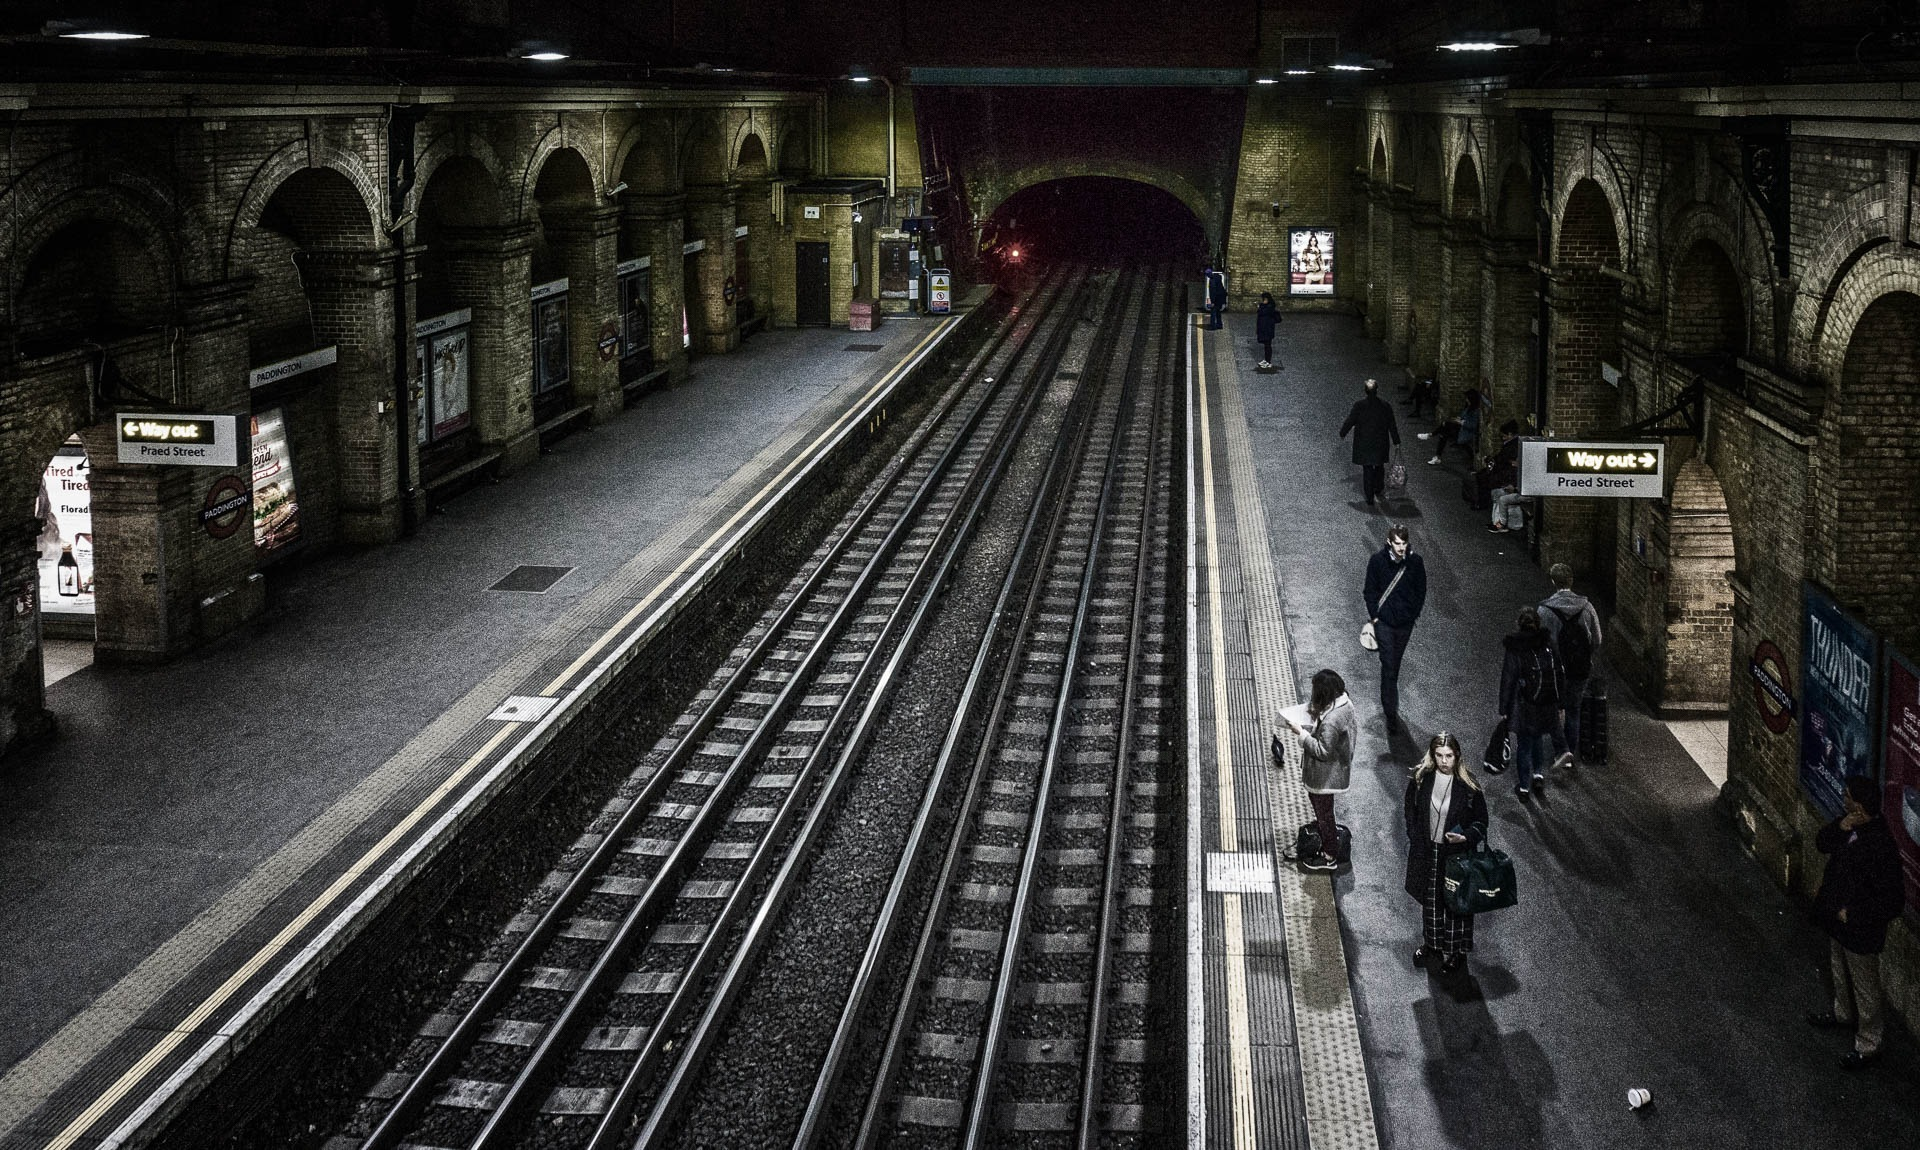 Going Underground by Clive Martin